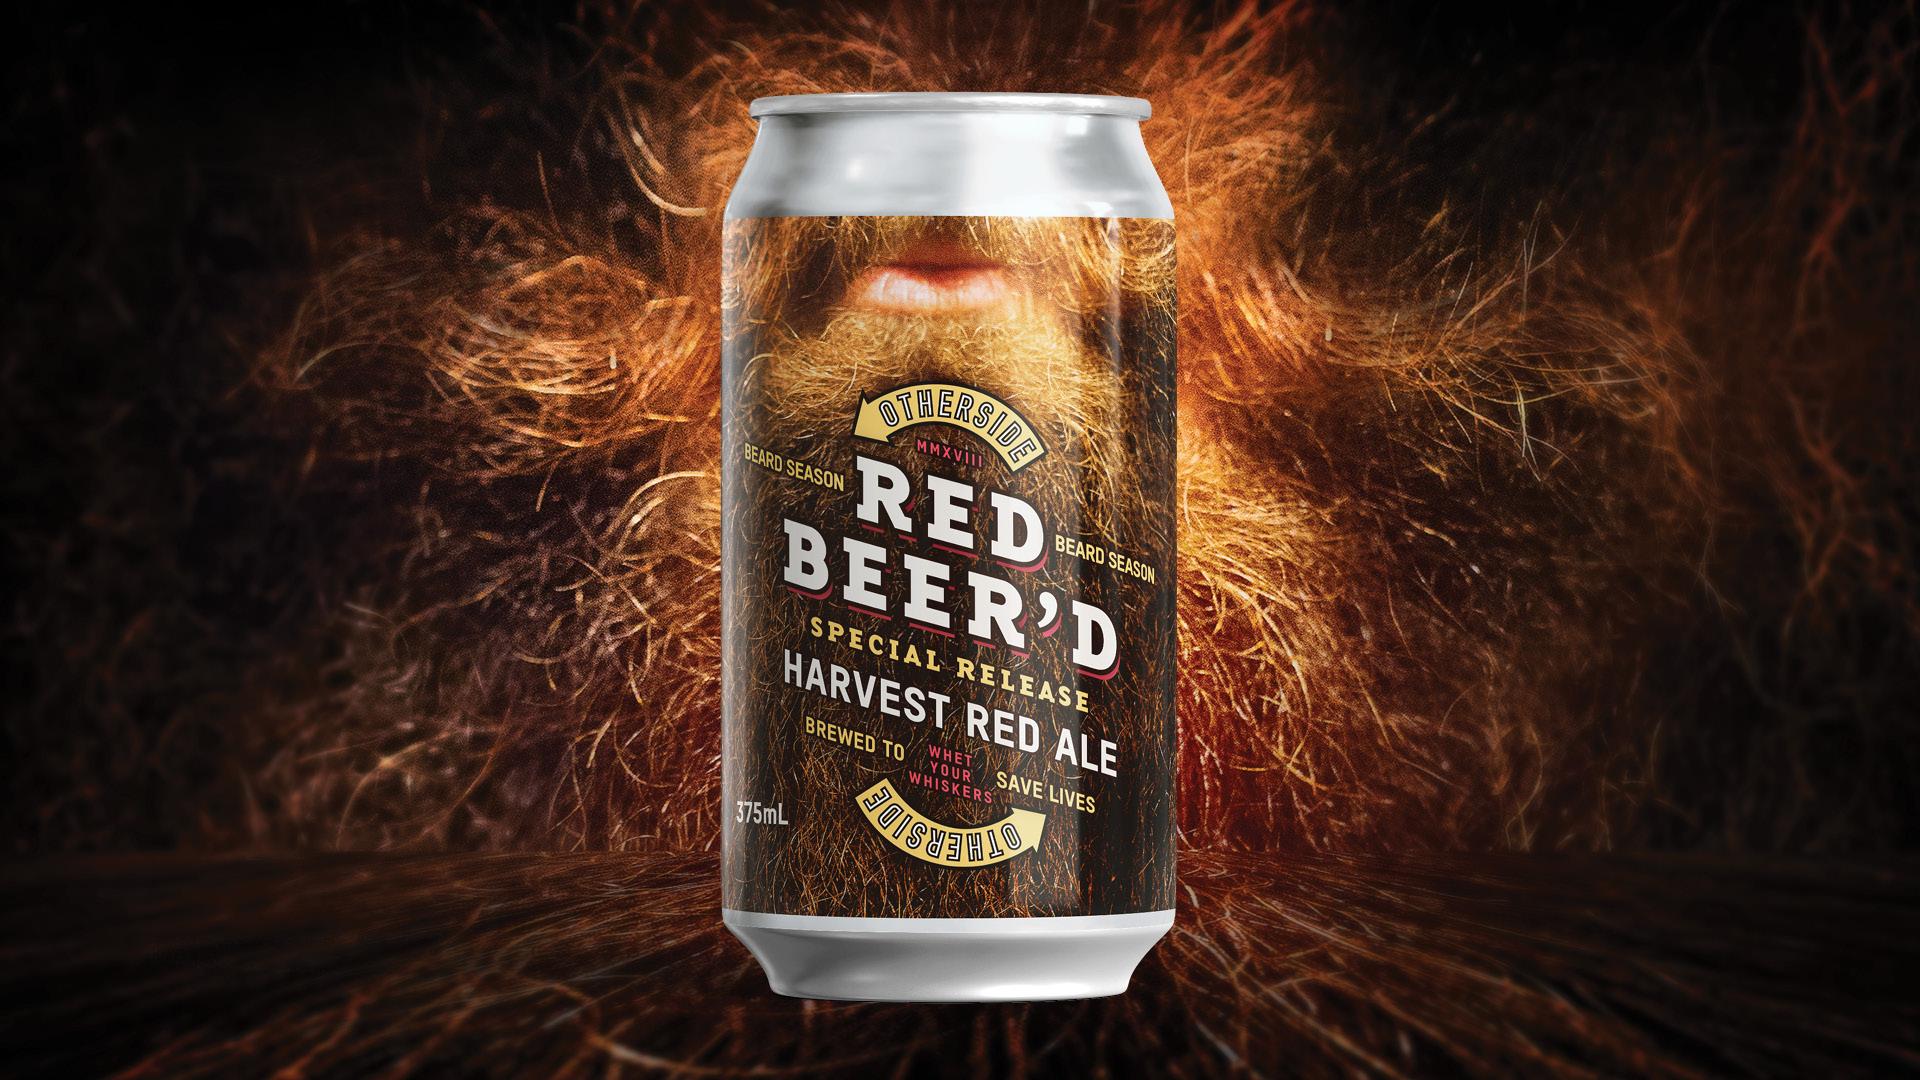 OTH-RED-BEERD-FB-HEADER-1080x1920-2